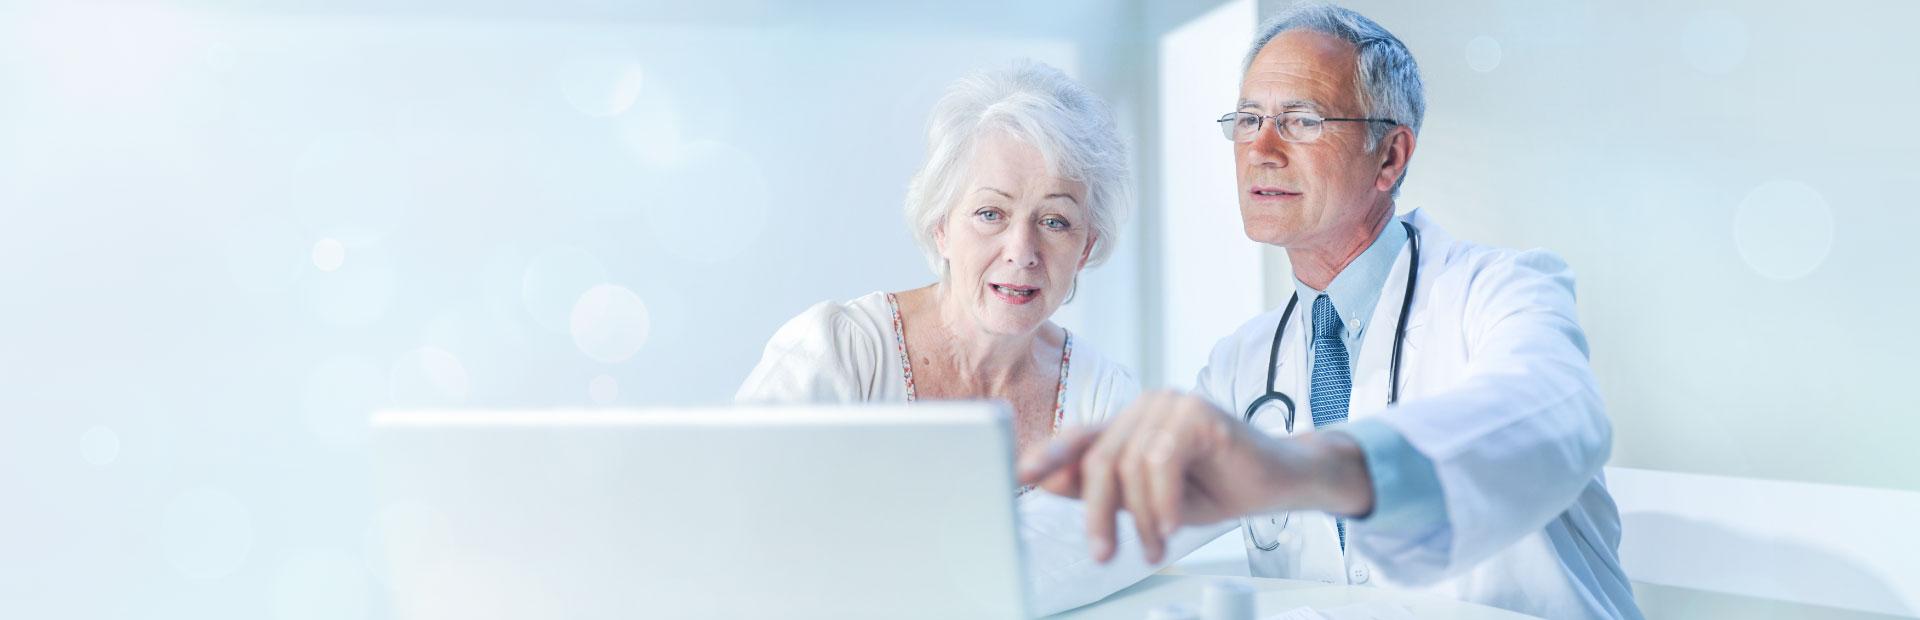 Sistema Médico que agiliza sua clínica